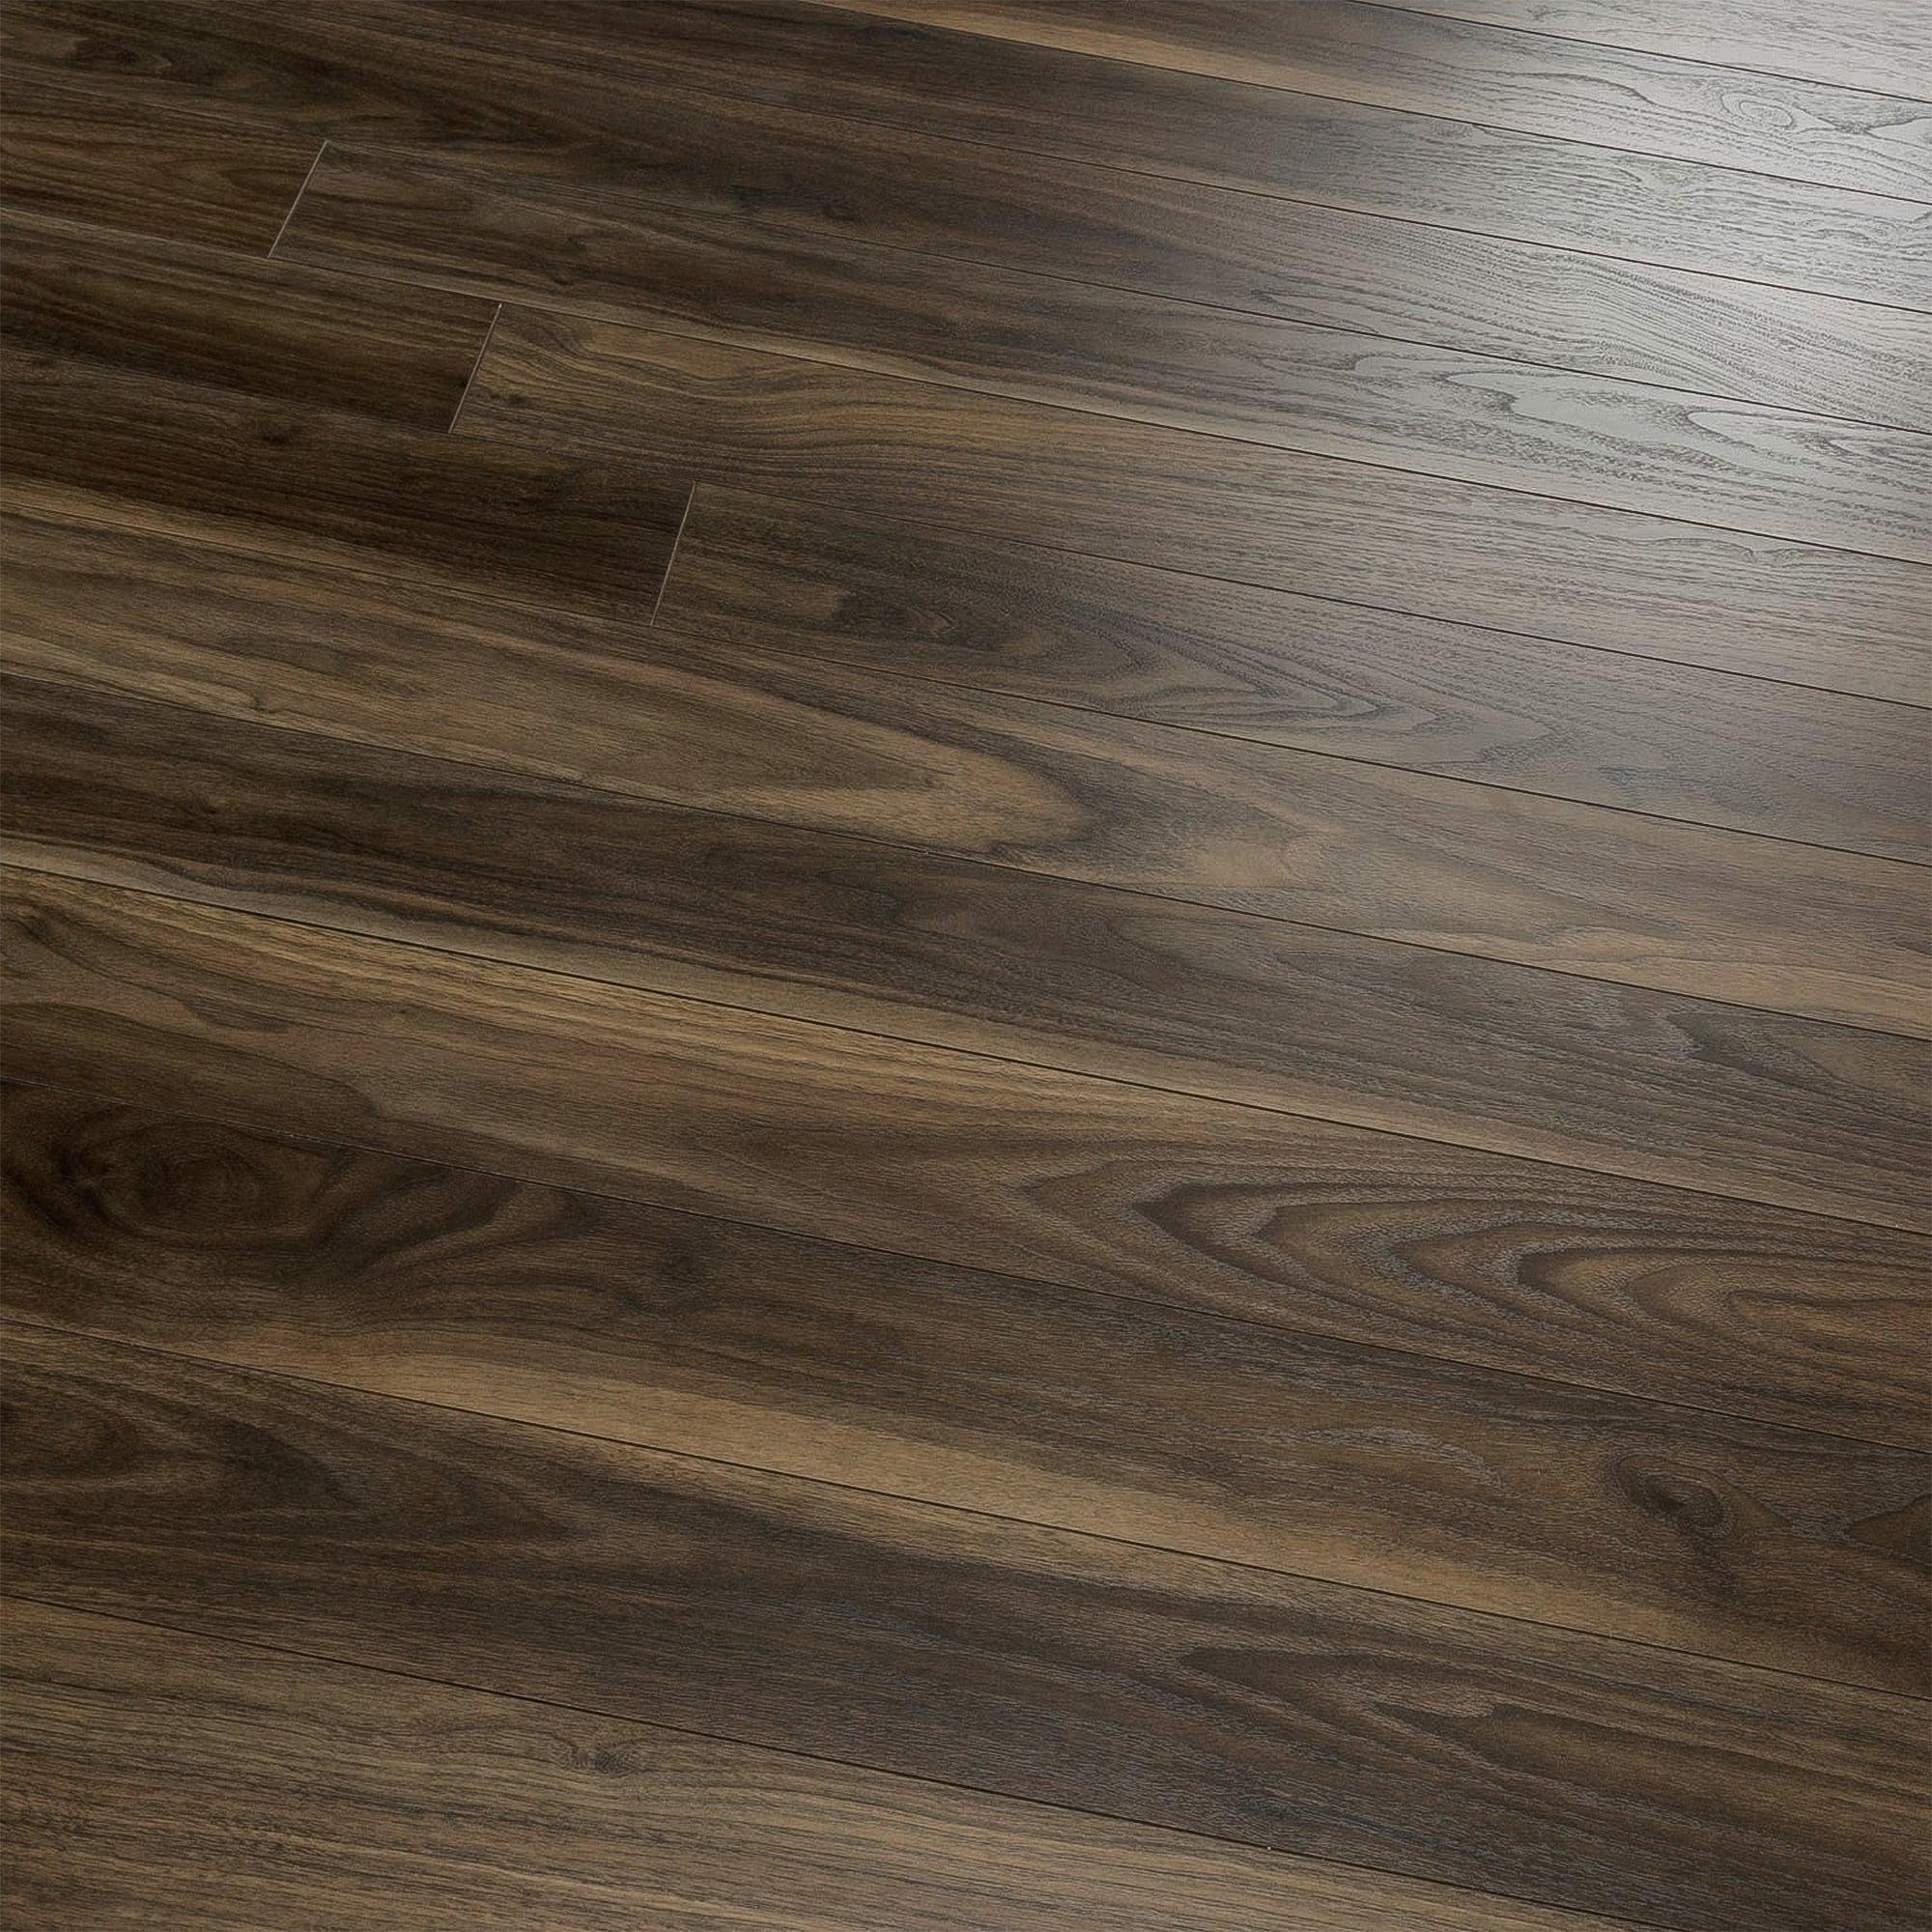 Walnut laminate flooring eternity antique walnut exotic for Balterio stockists